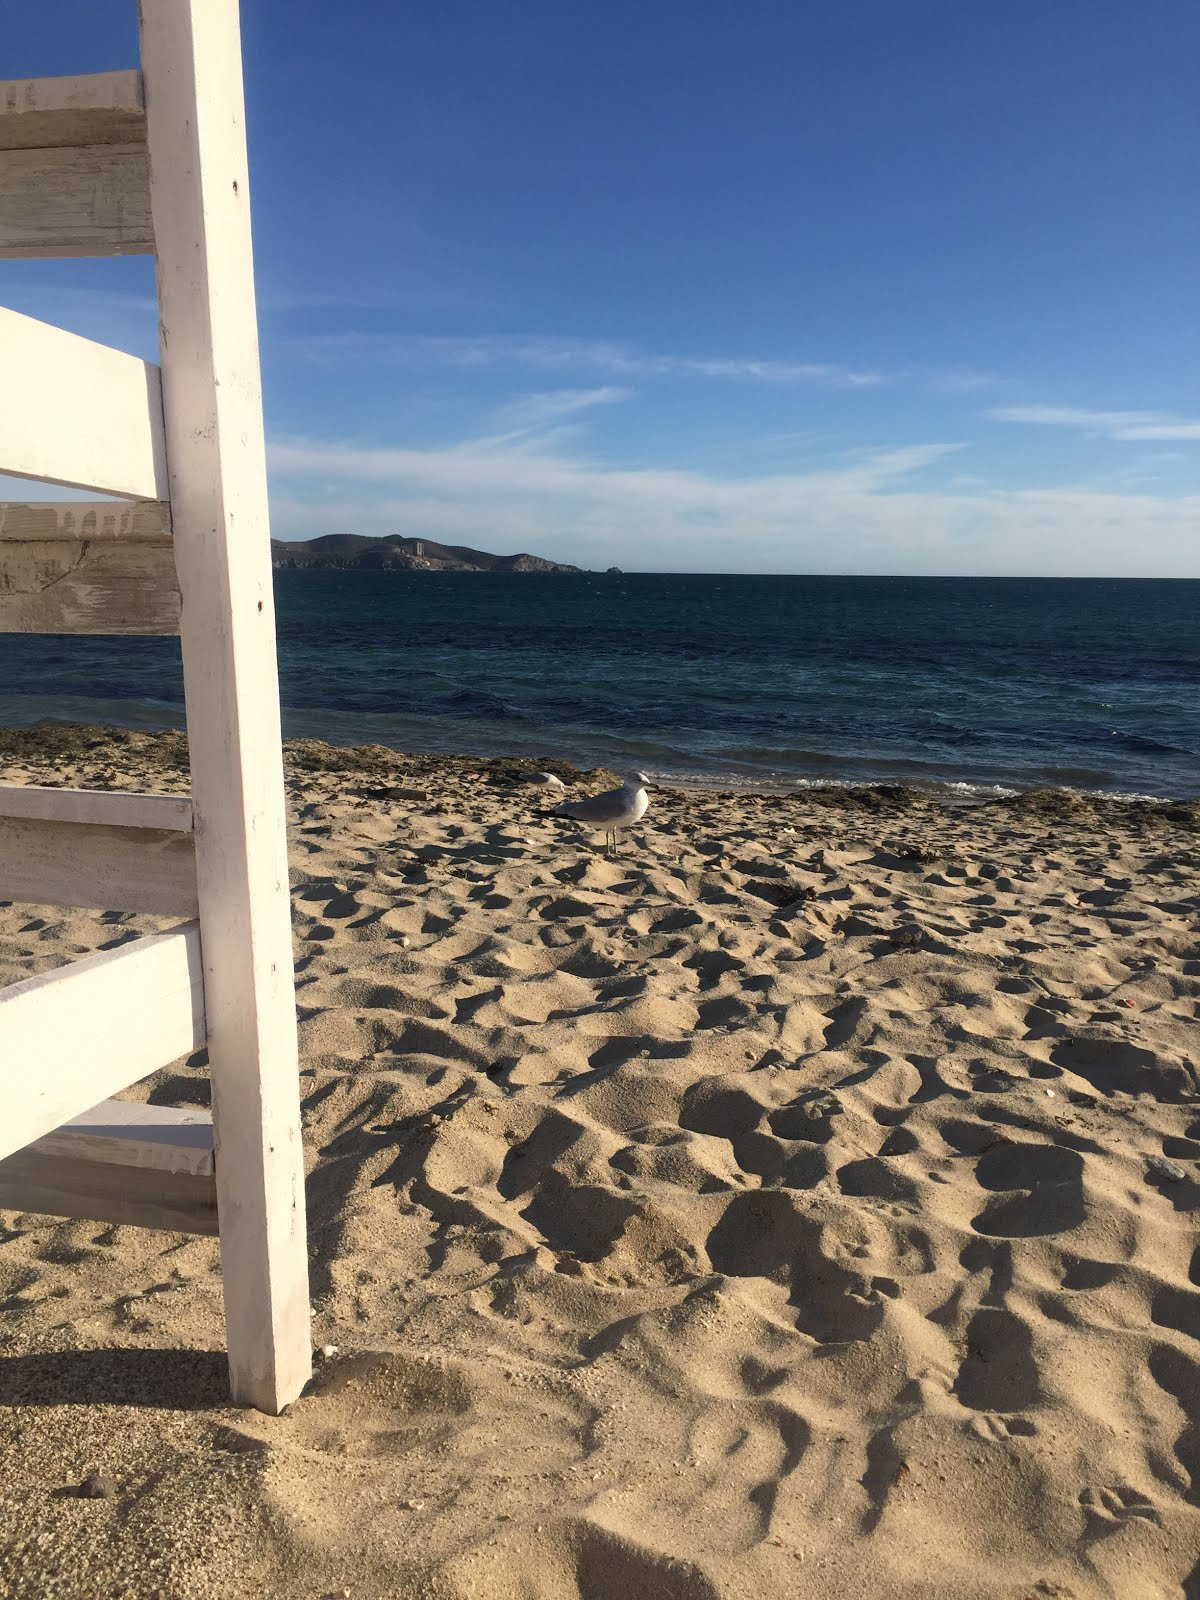 la playa de los algodones au nord ouest du mexique